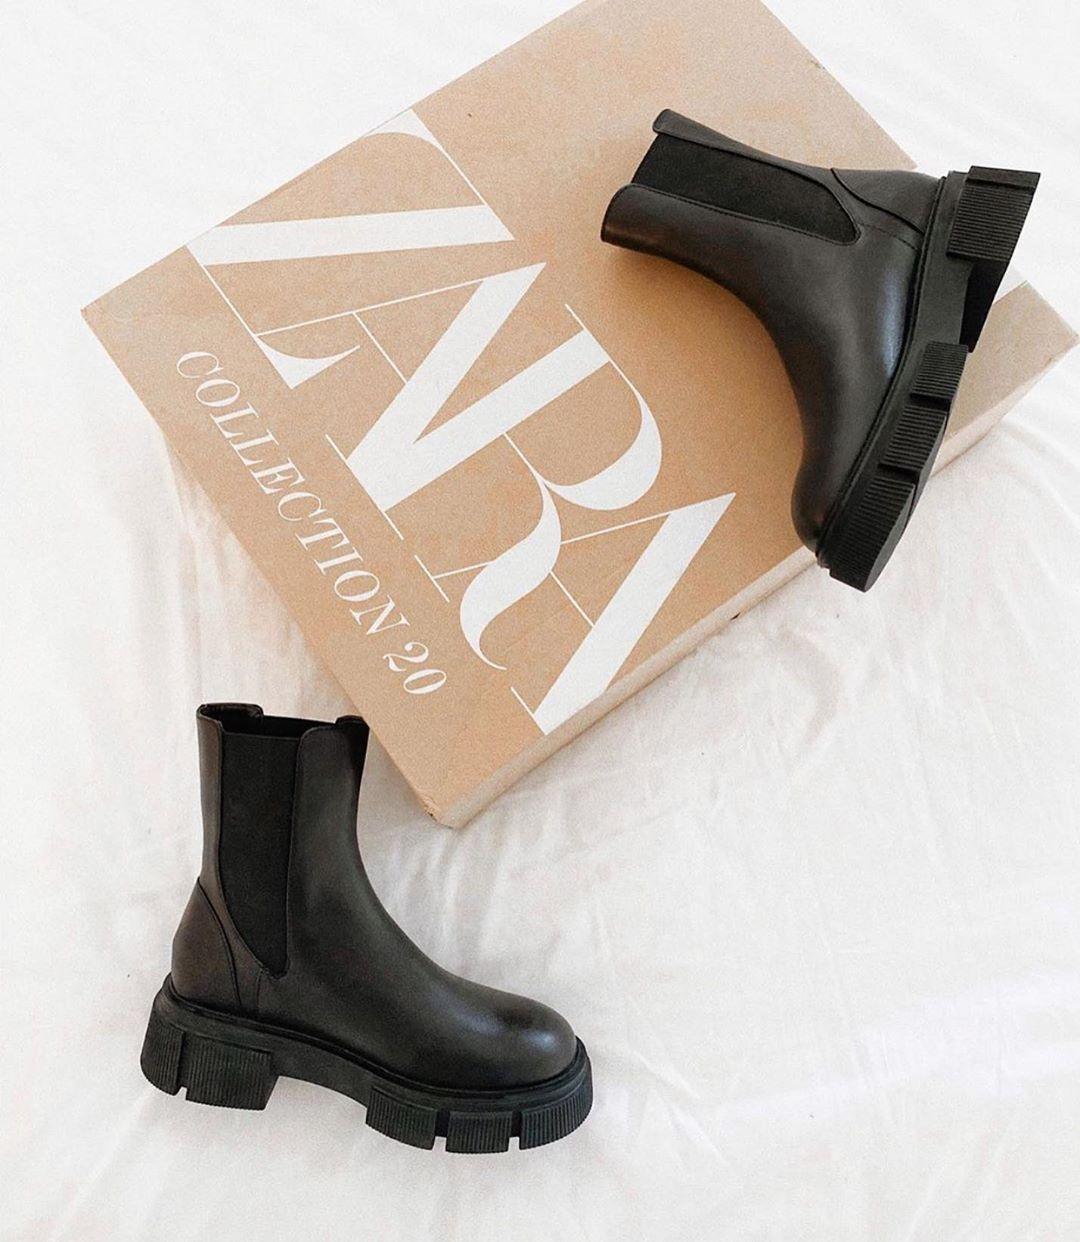 track leather flat ankle boots de Zara sur zaraaddiction